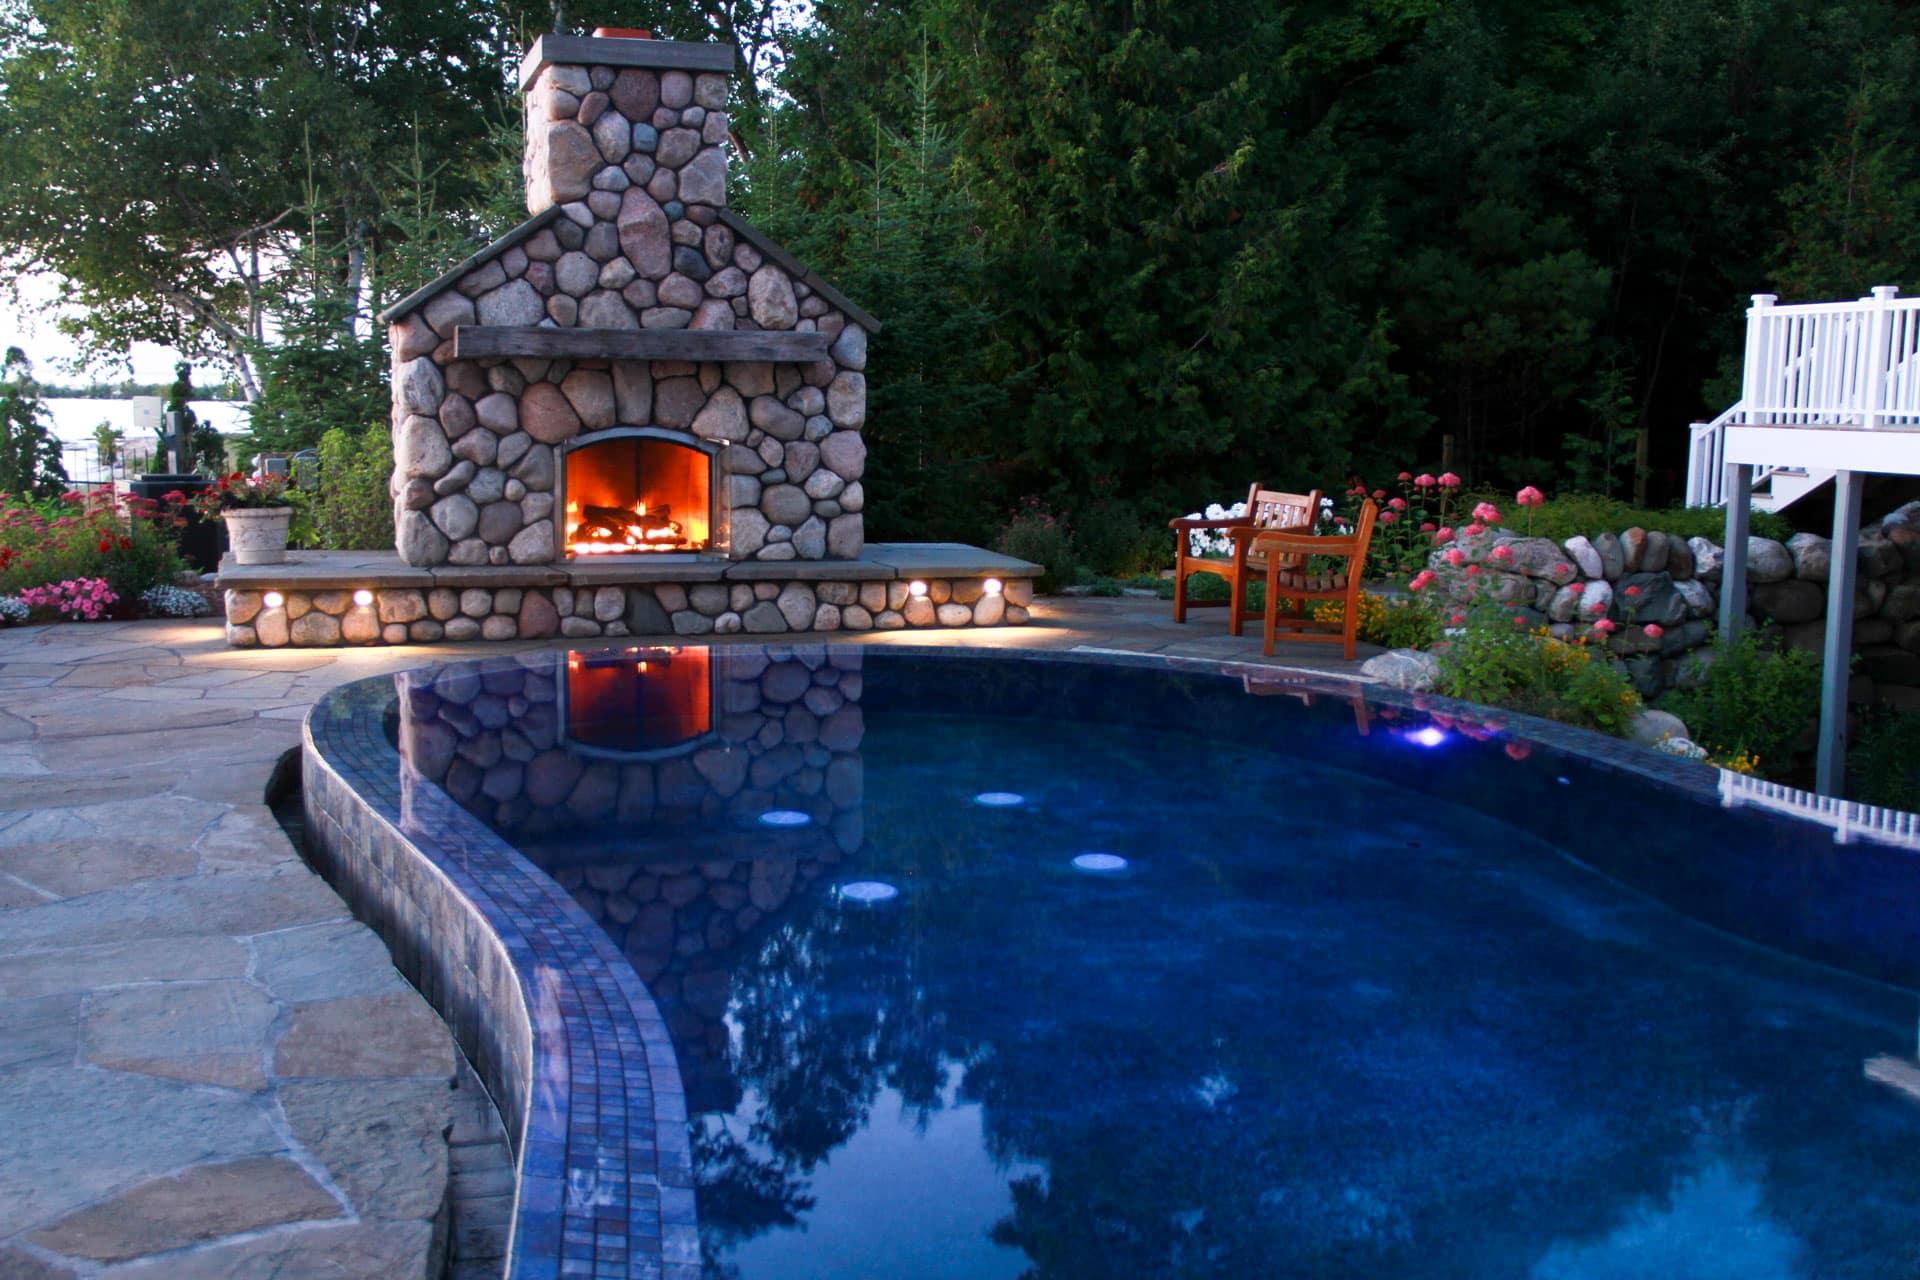 Landscaped Outdoor Living Fire Pit Ideas Simplified Drost Landscape